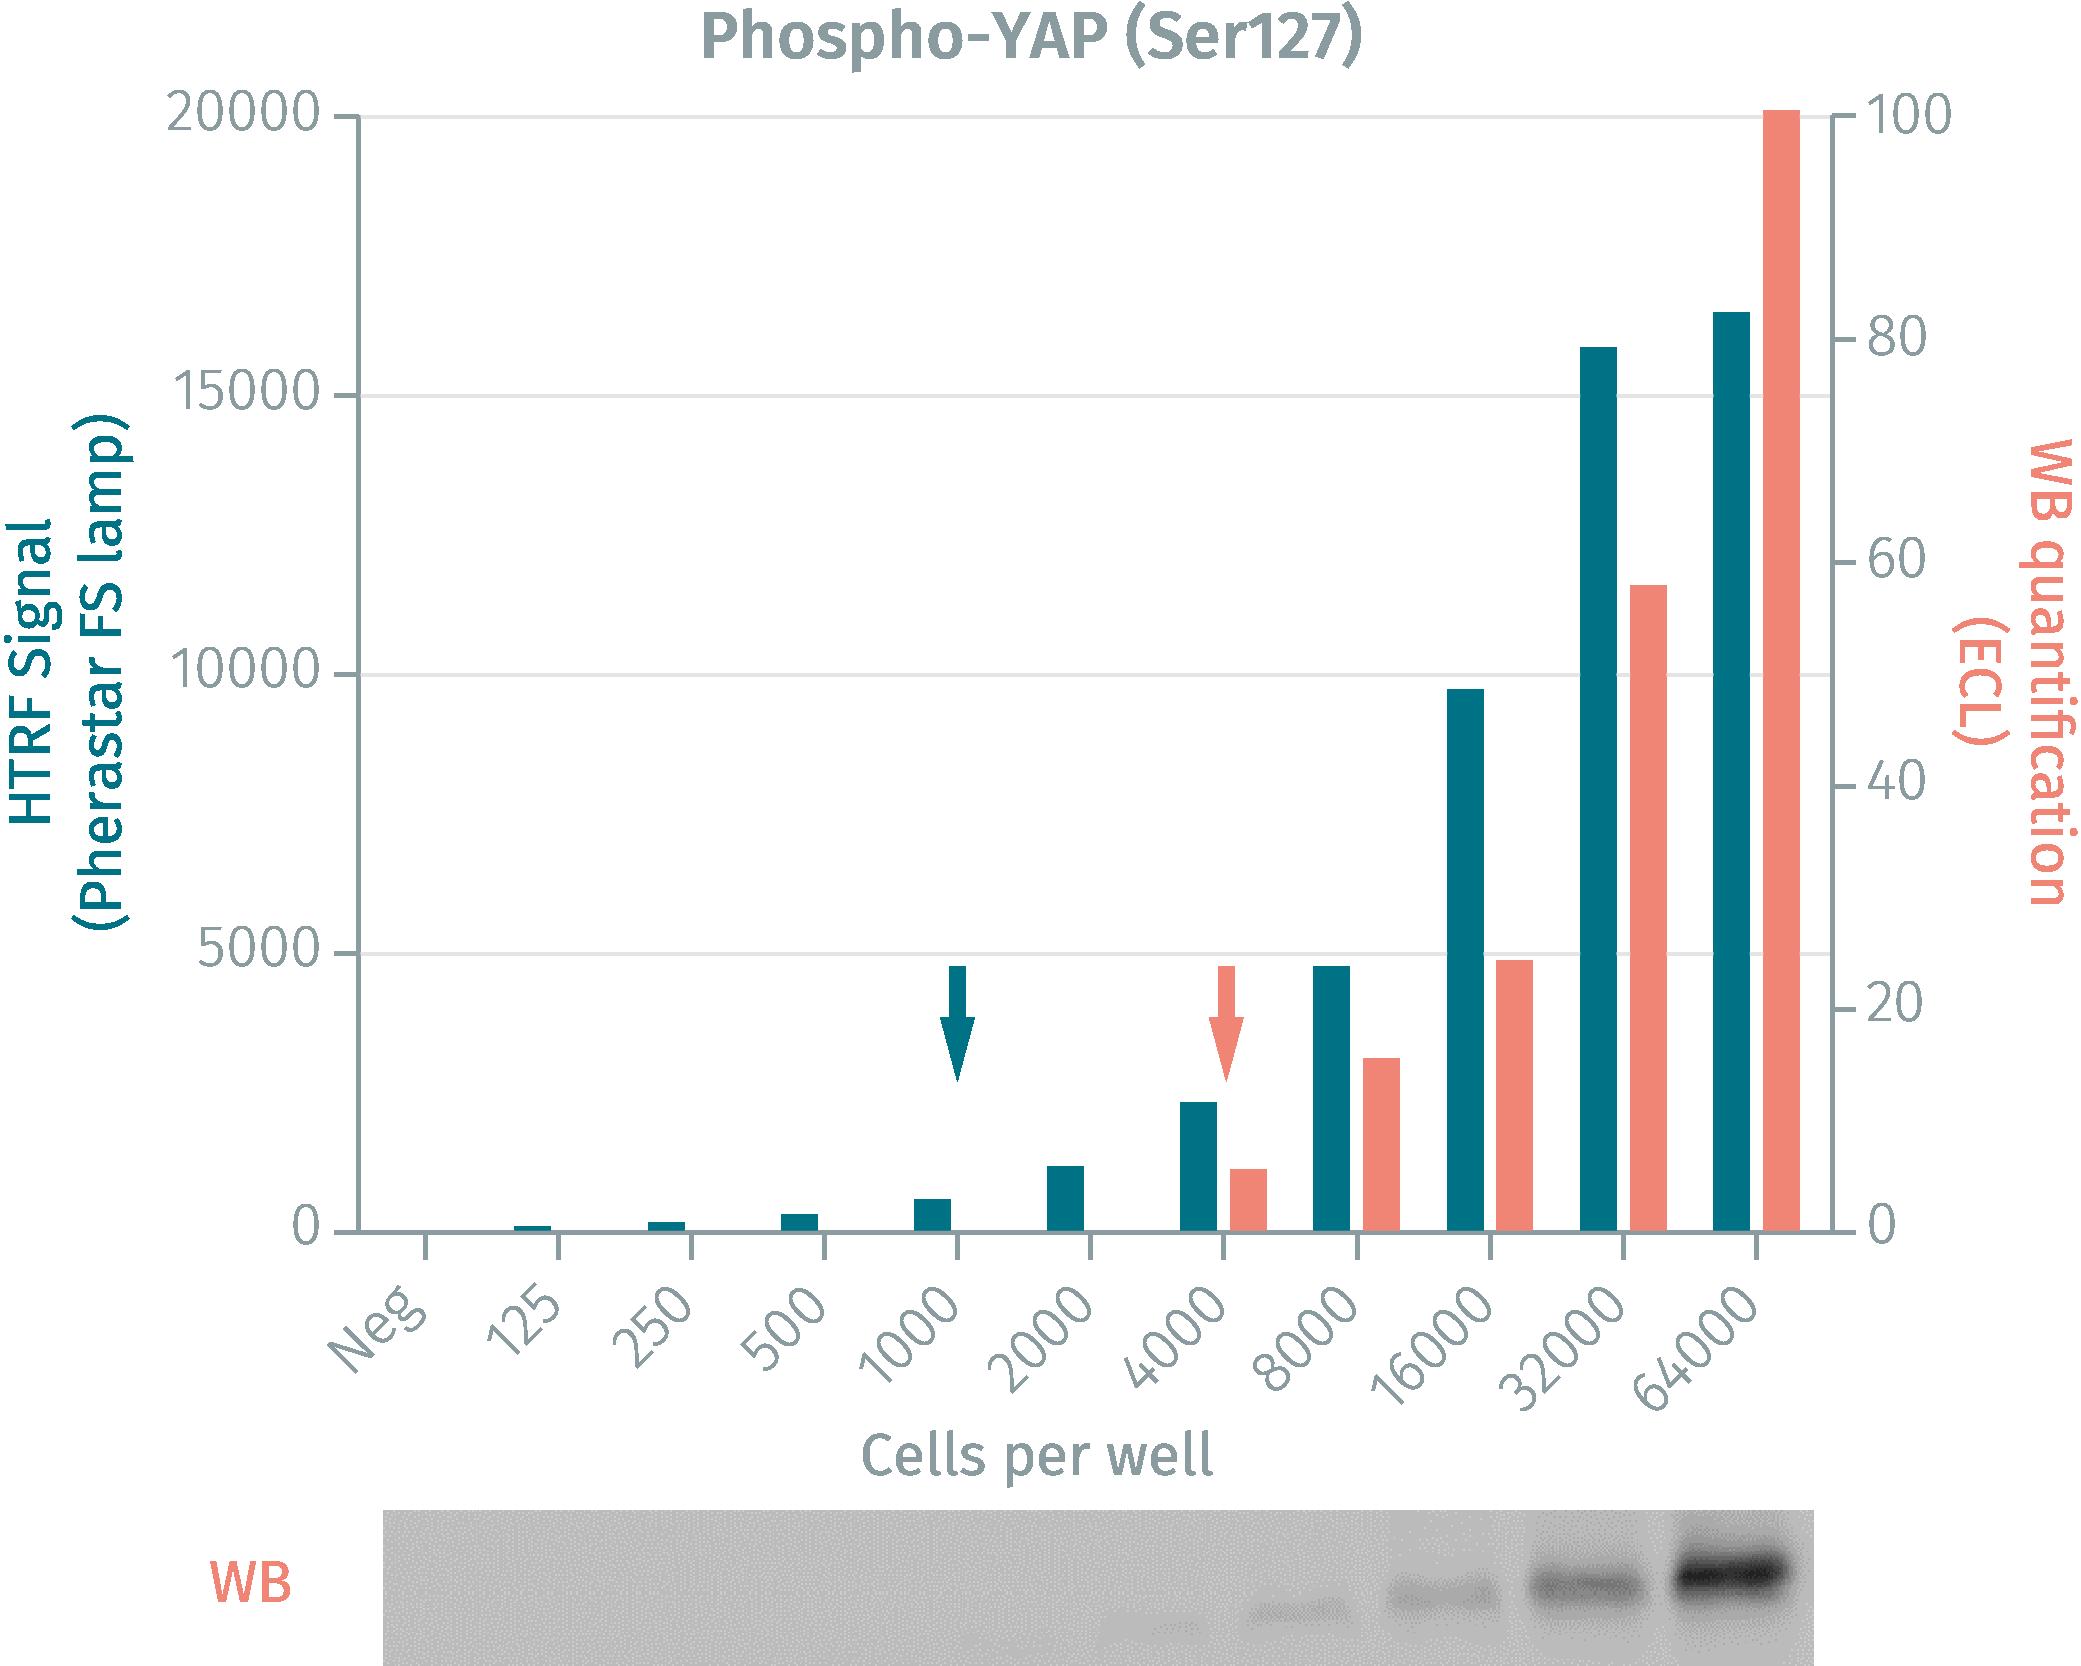 HTRF phospho-YAP cellular assay vs Western Blot